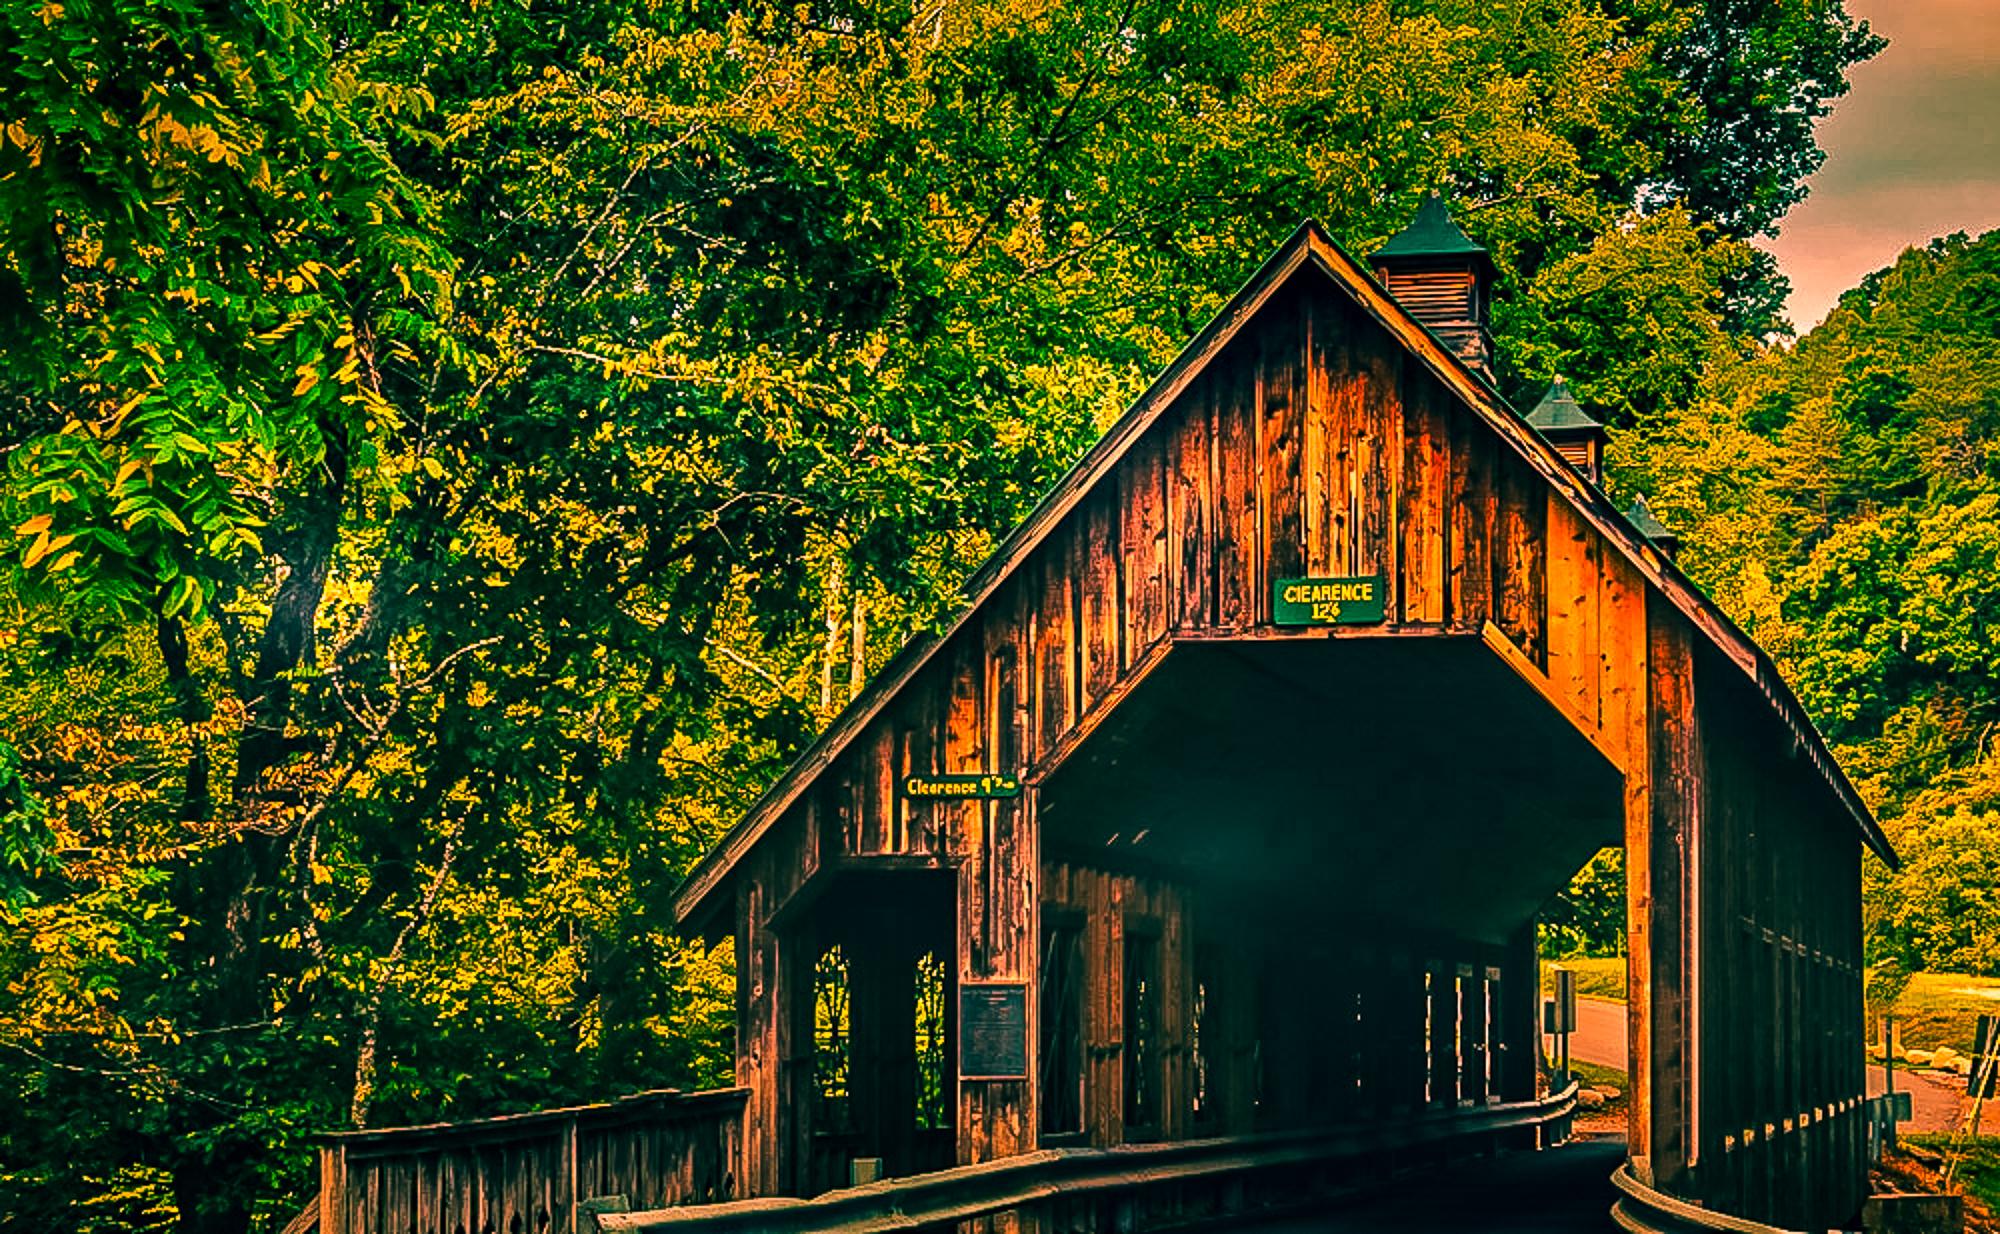 58078A - Covered Bridge Entrance